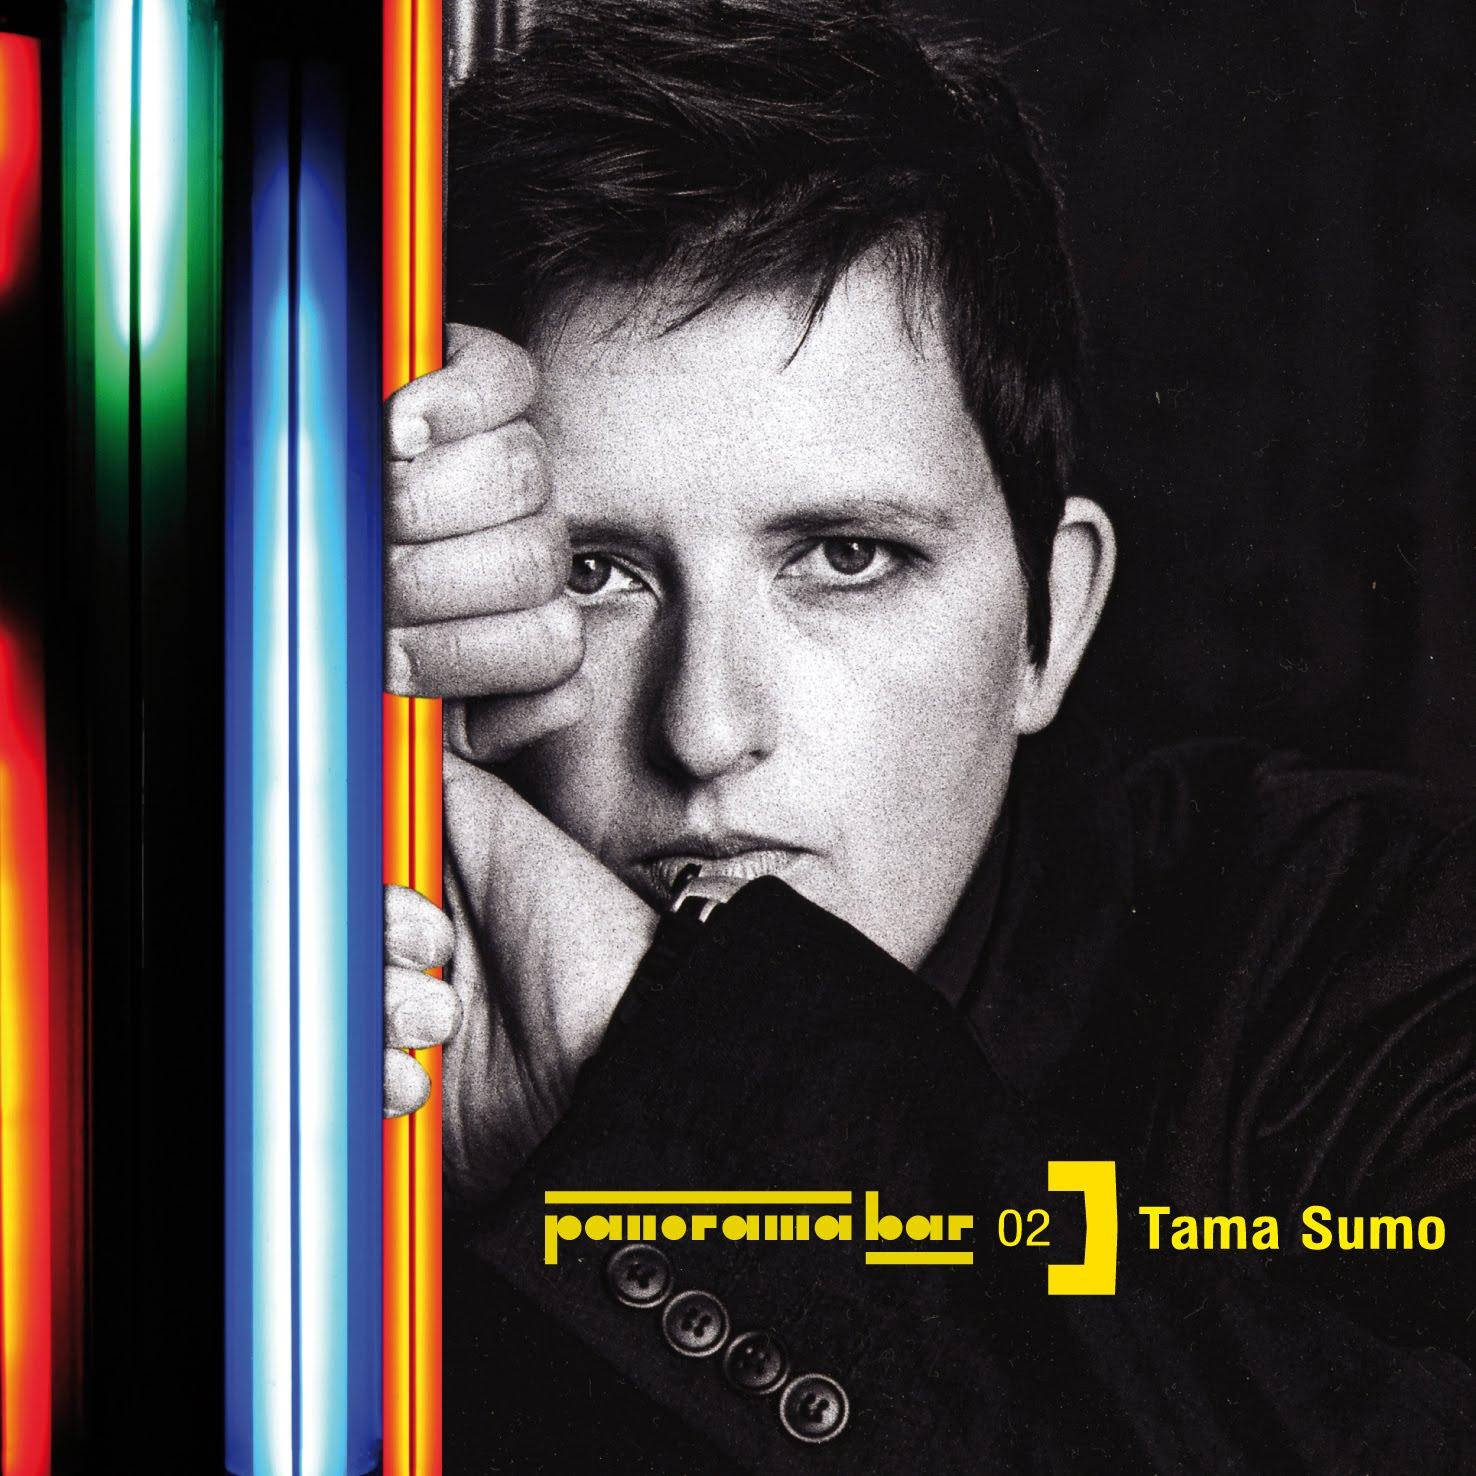 Tama_Sumo_-_Panorama_Bar_02-ostgutcd10